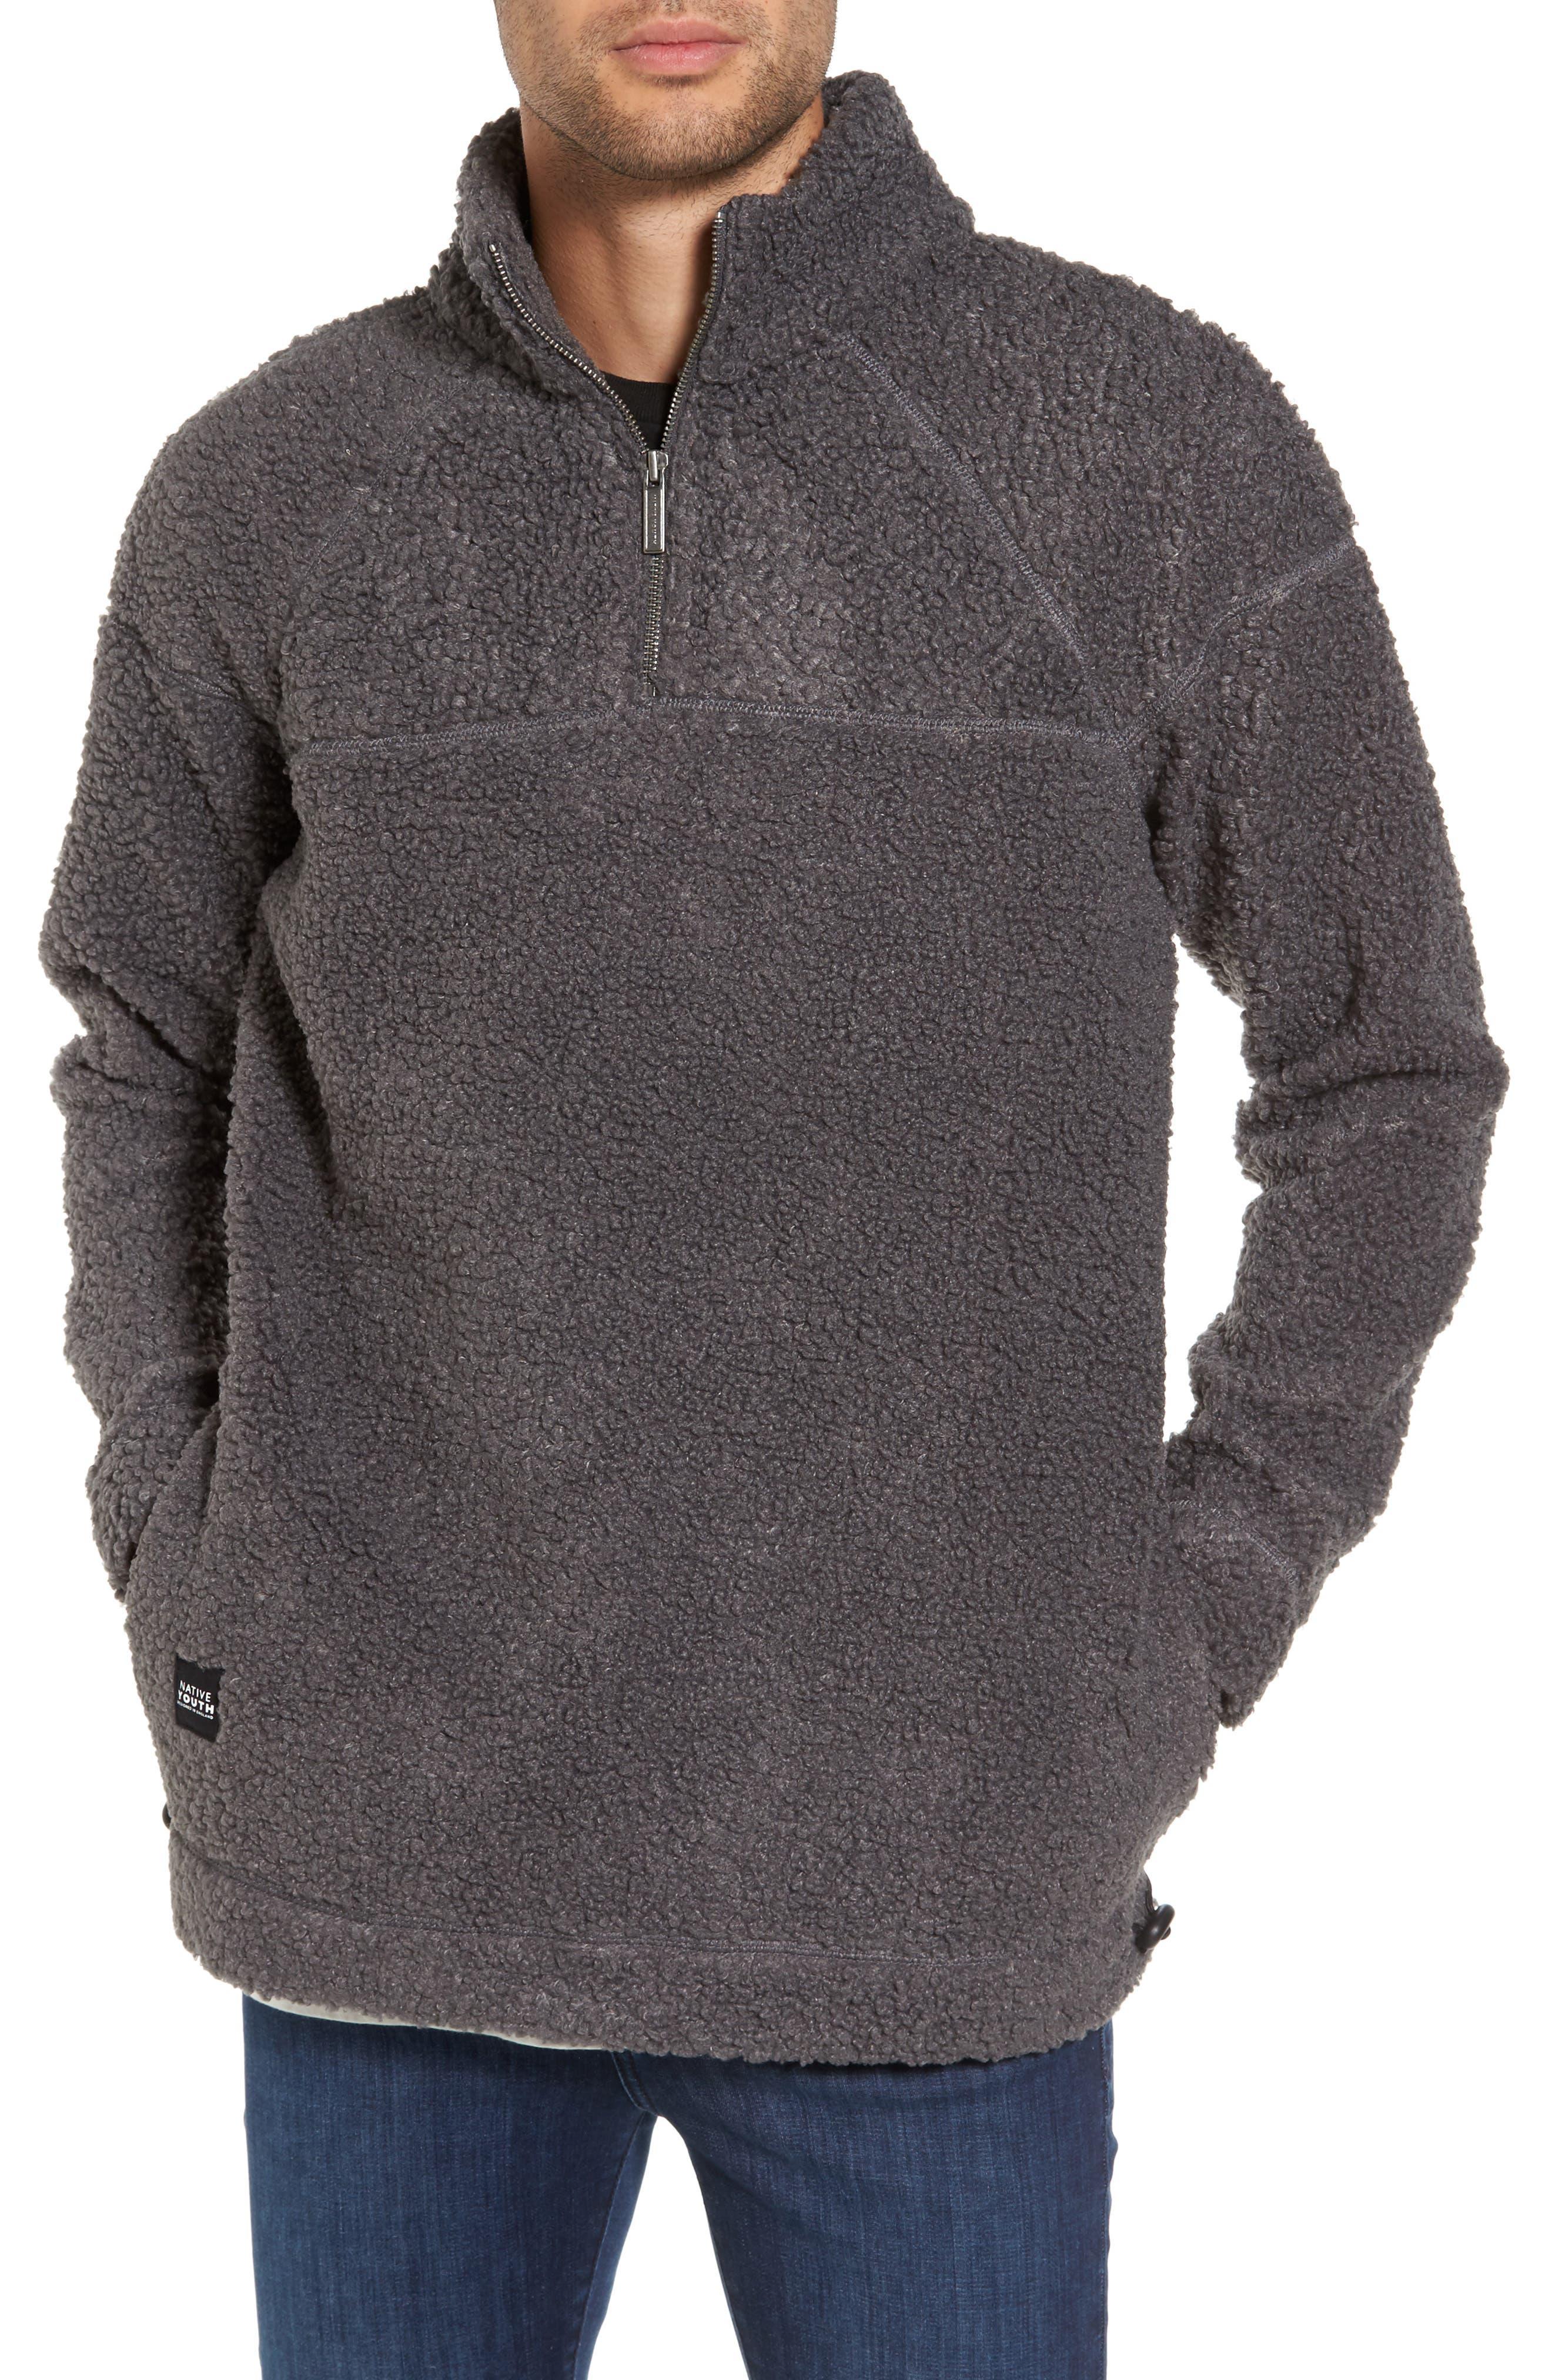 Warlock Faux Shearling Quarter Zip Sweater,                             Main thumbnail 1, color,                             023